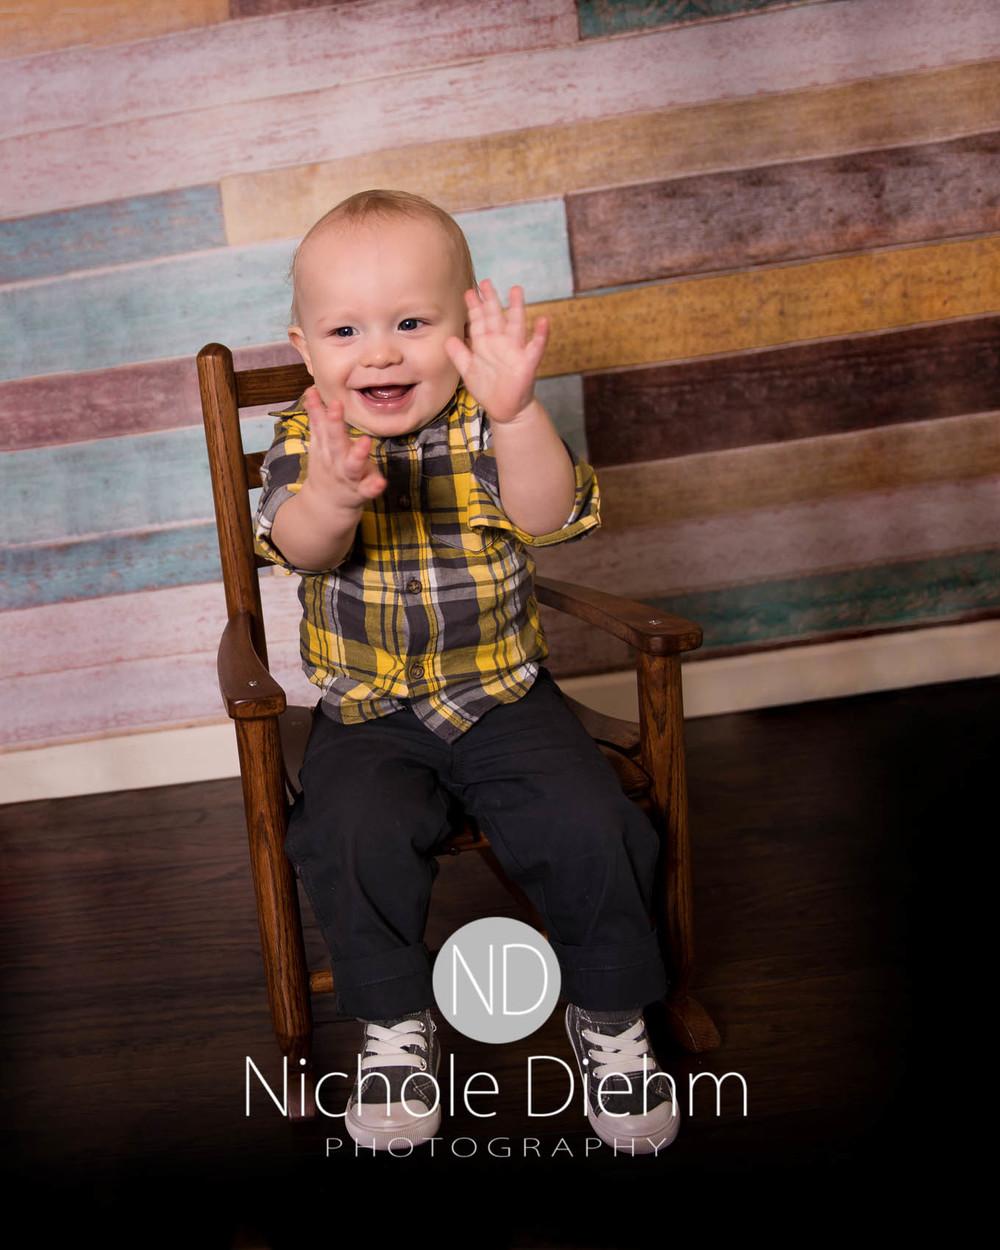 Nichole Diehm Photography 1 year photography Diderik-3.jpg